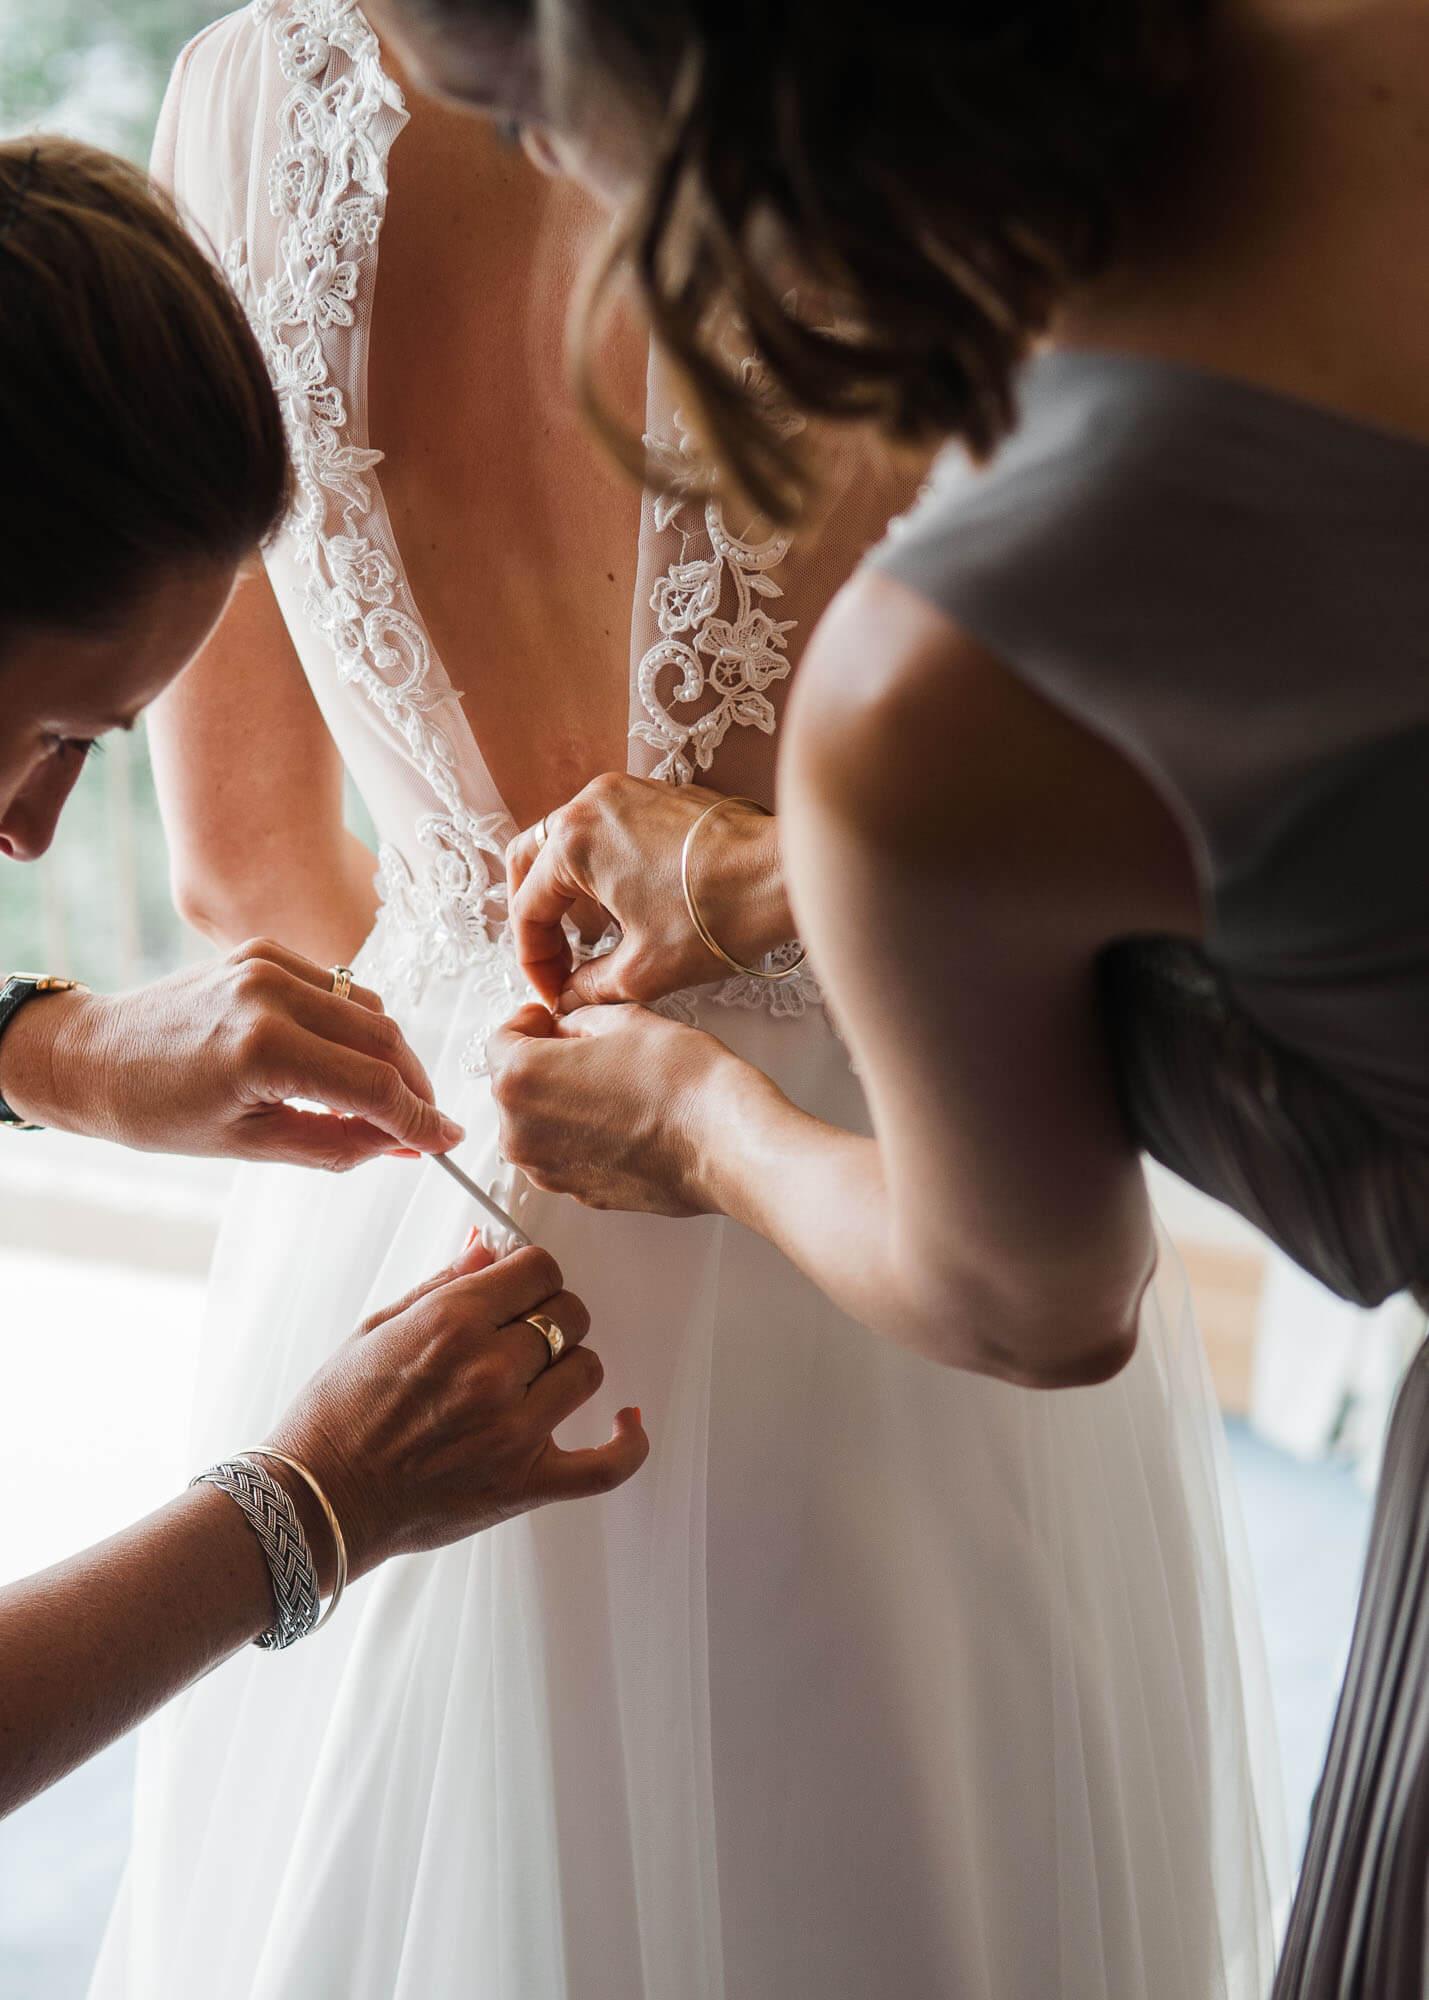 bridesmaids-fasten-boho-brides-dress.jpg